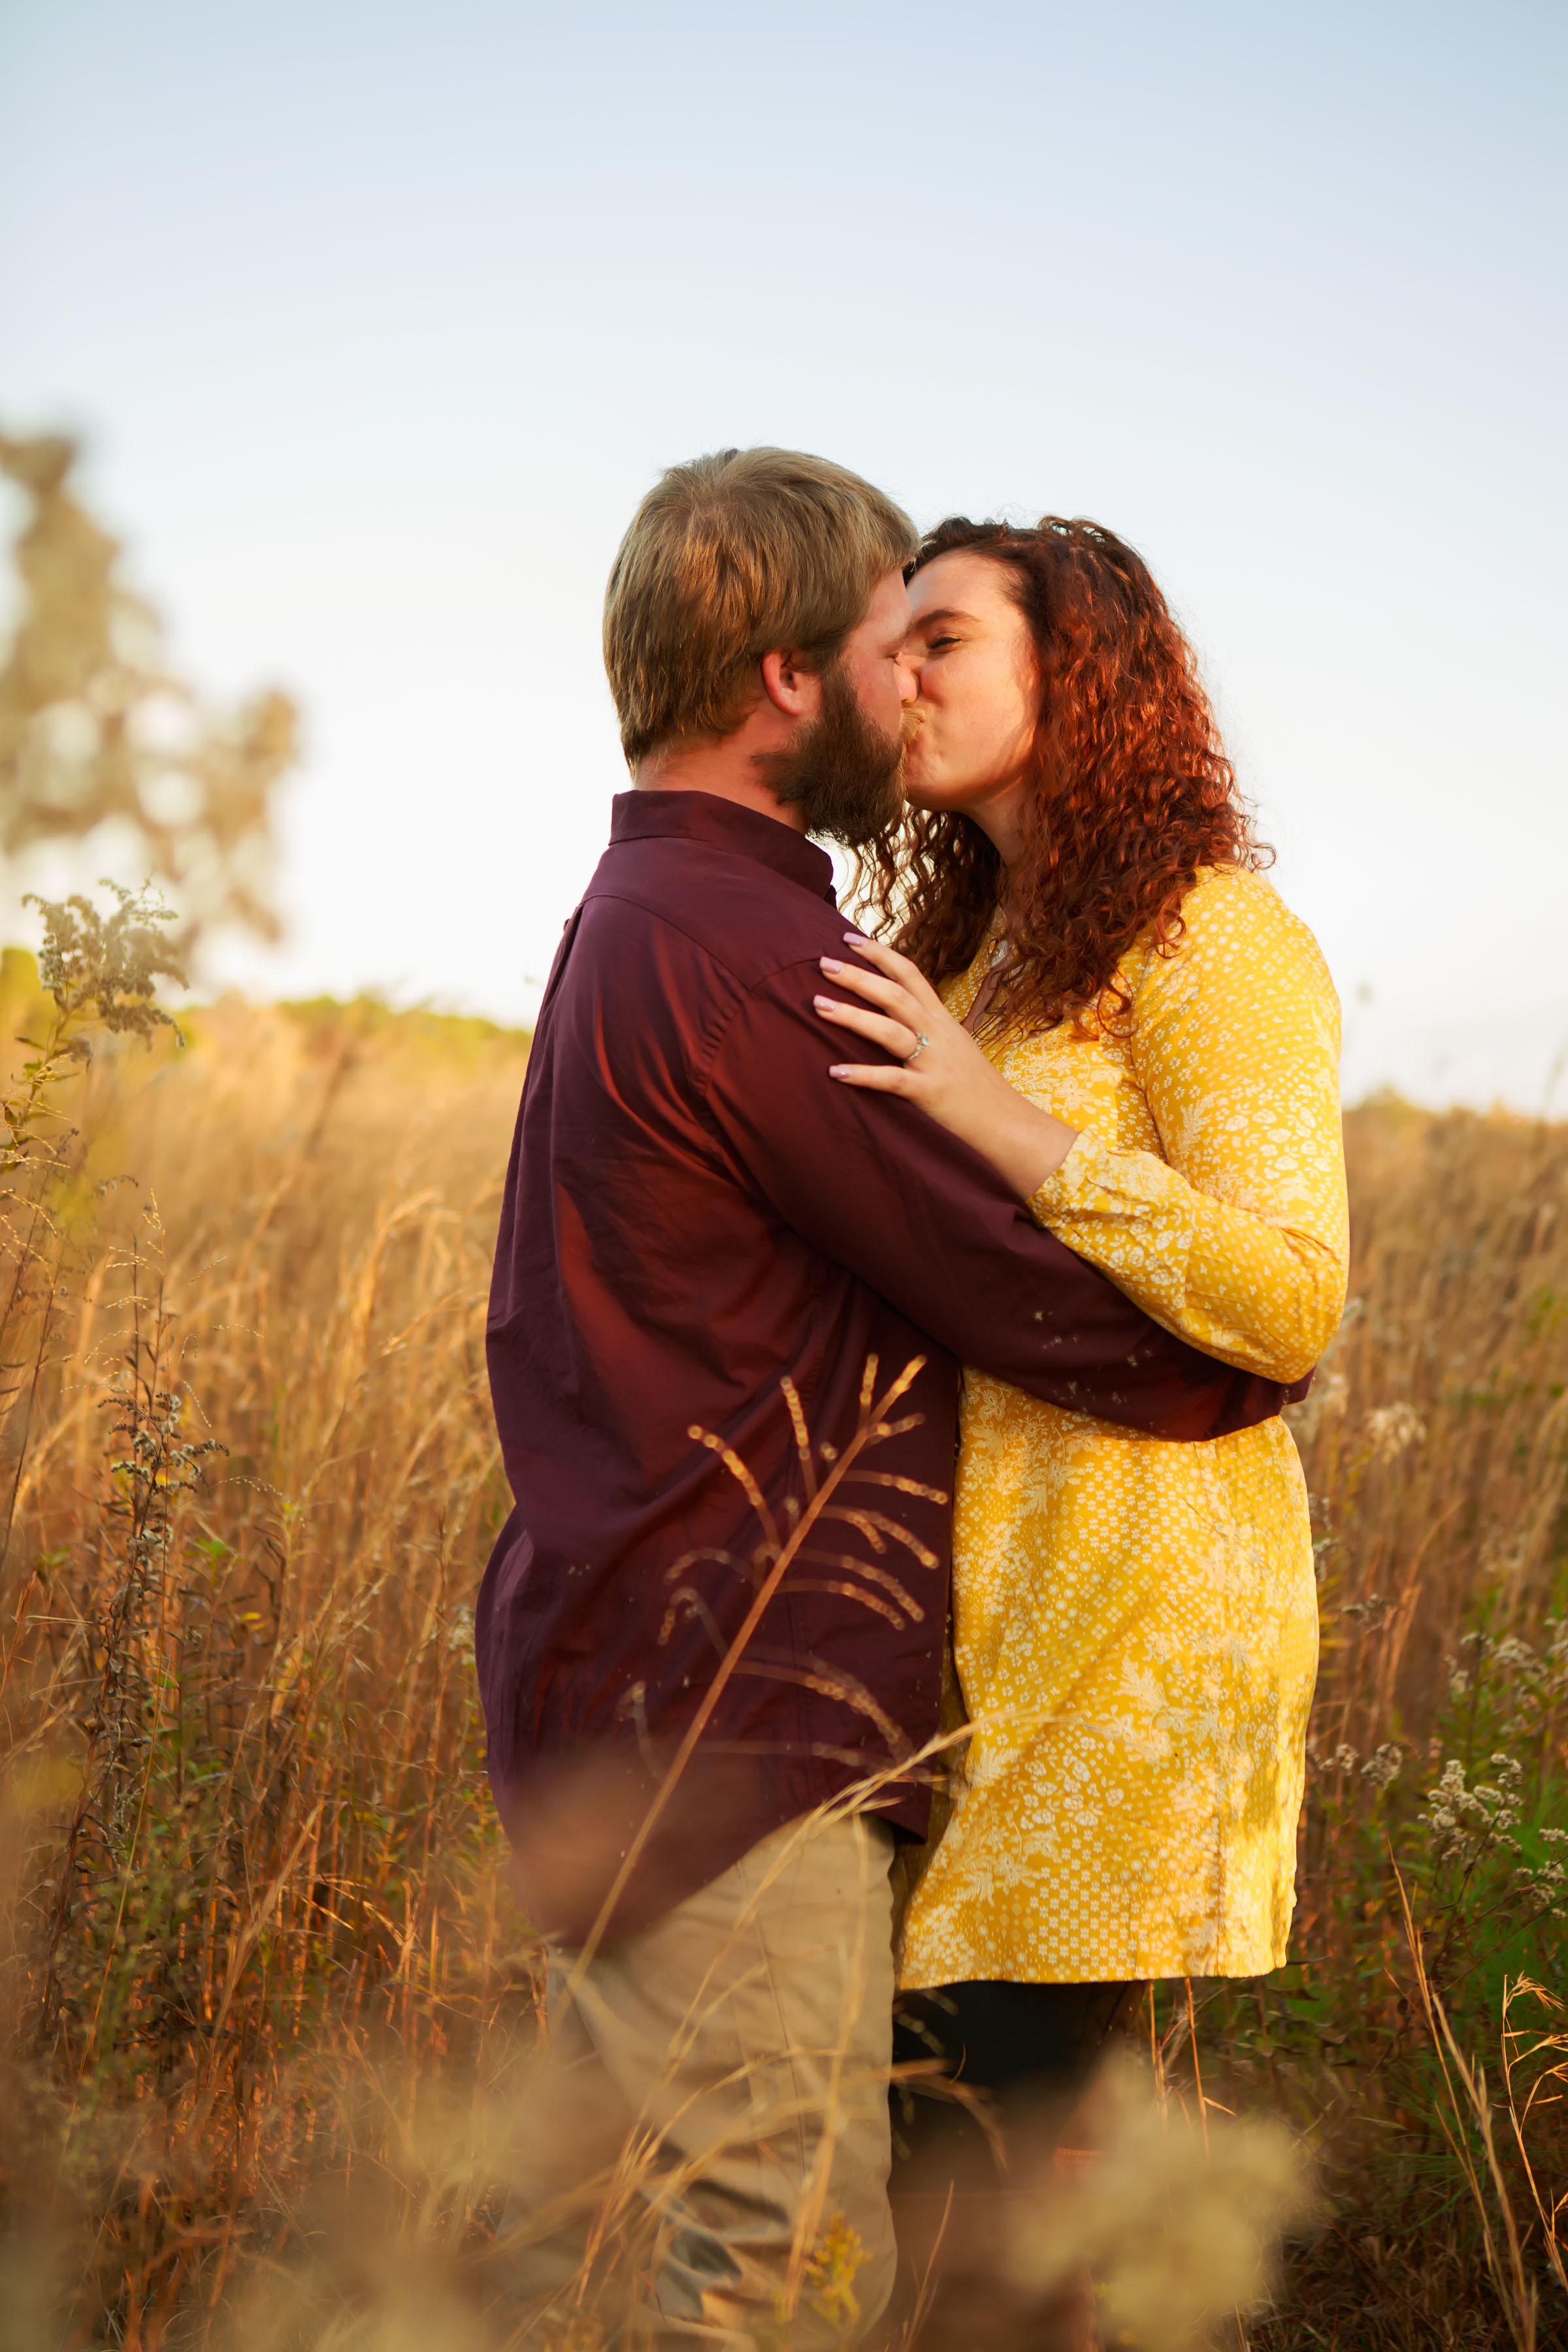 Wilmington_NC_Engagement_Photos_Tiffany_Abruzzo_Photography_22.jpg